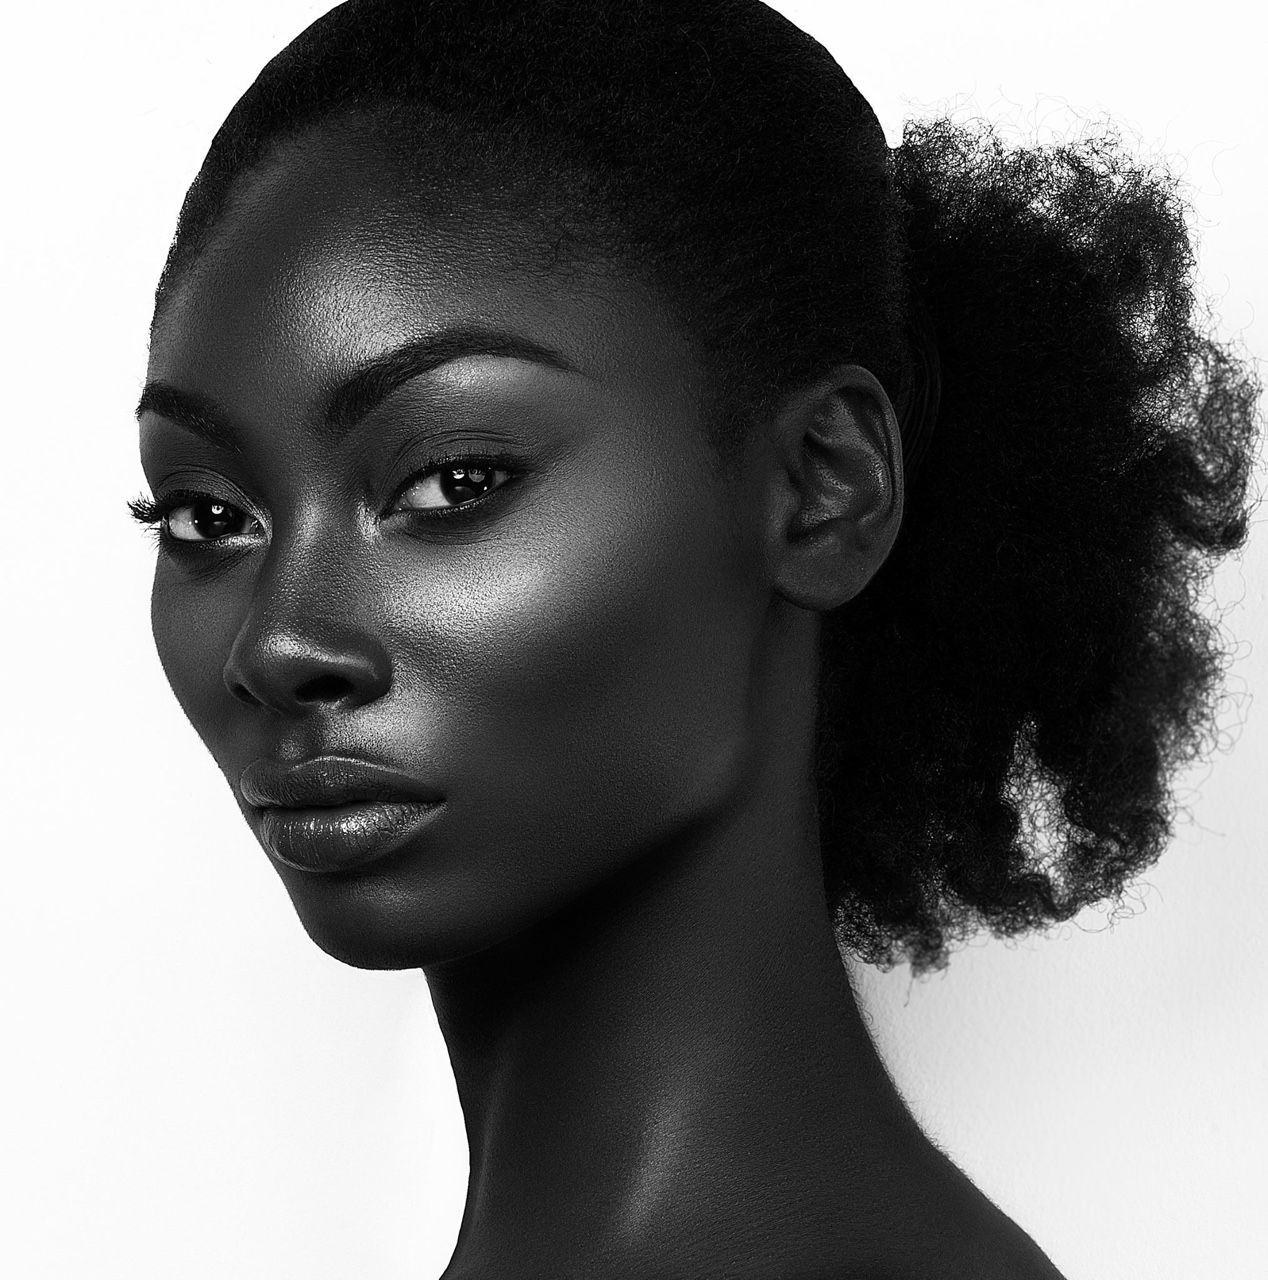 Fibi black women facial anal